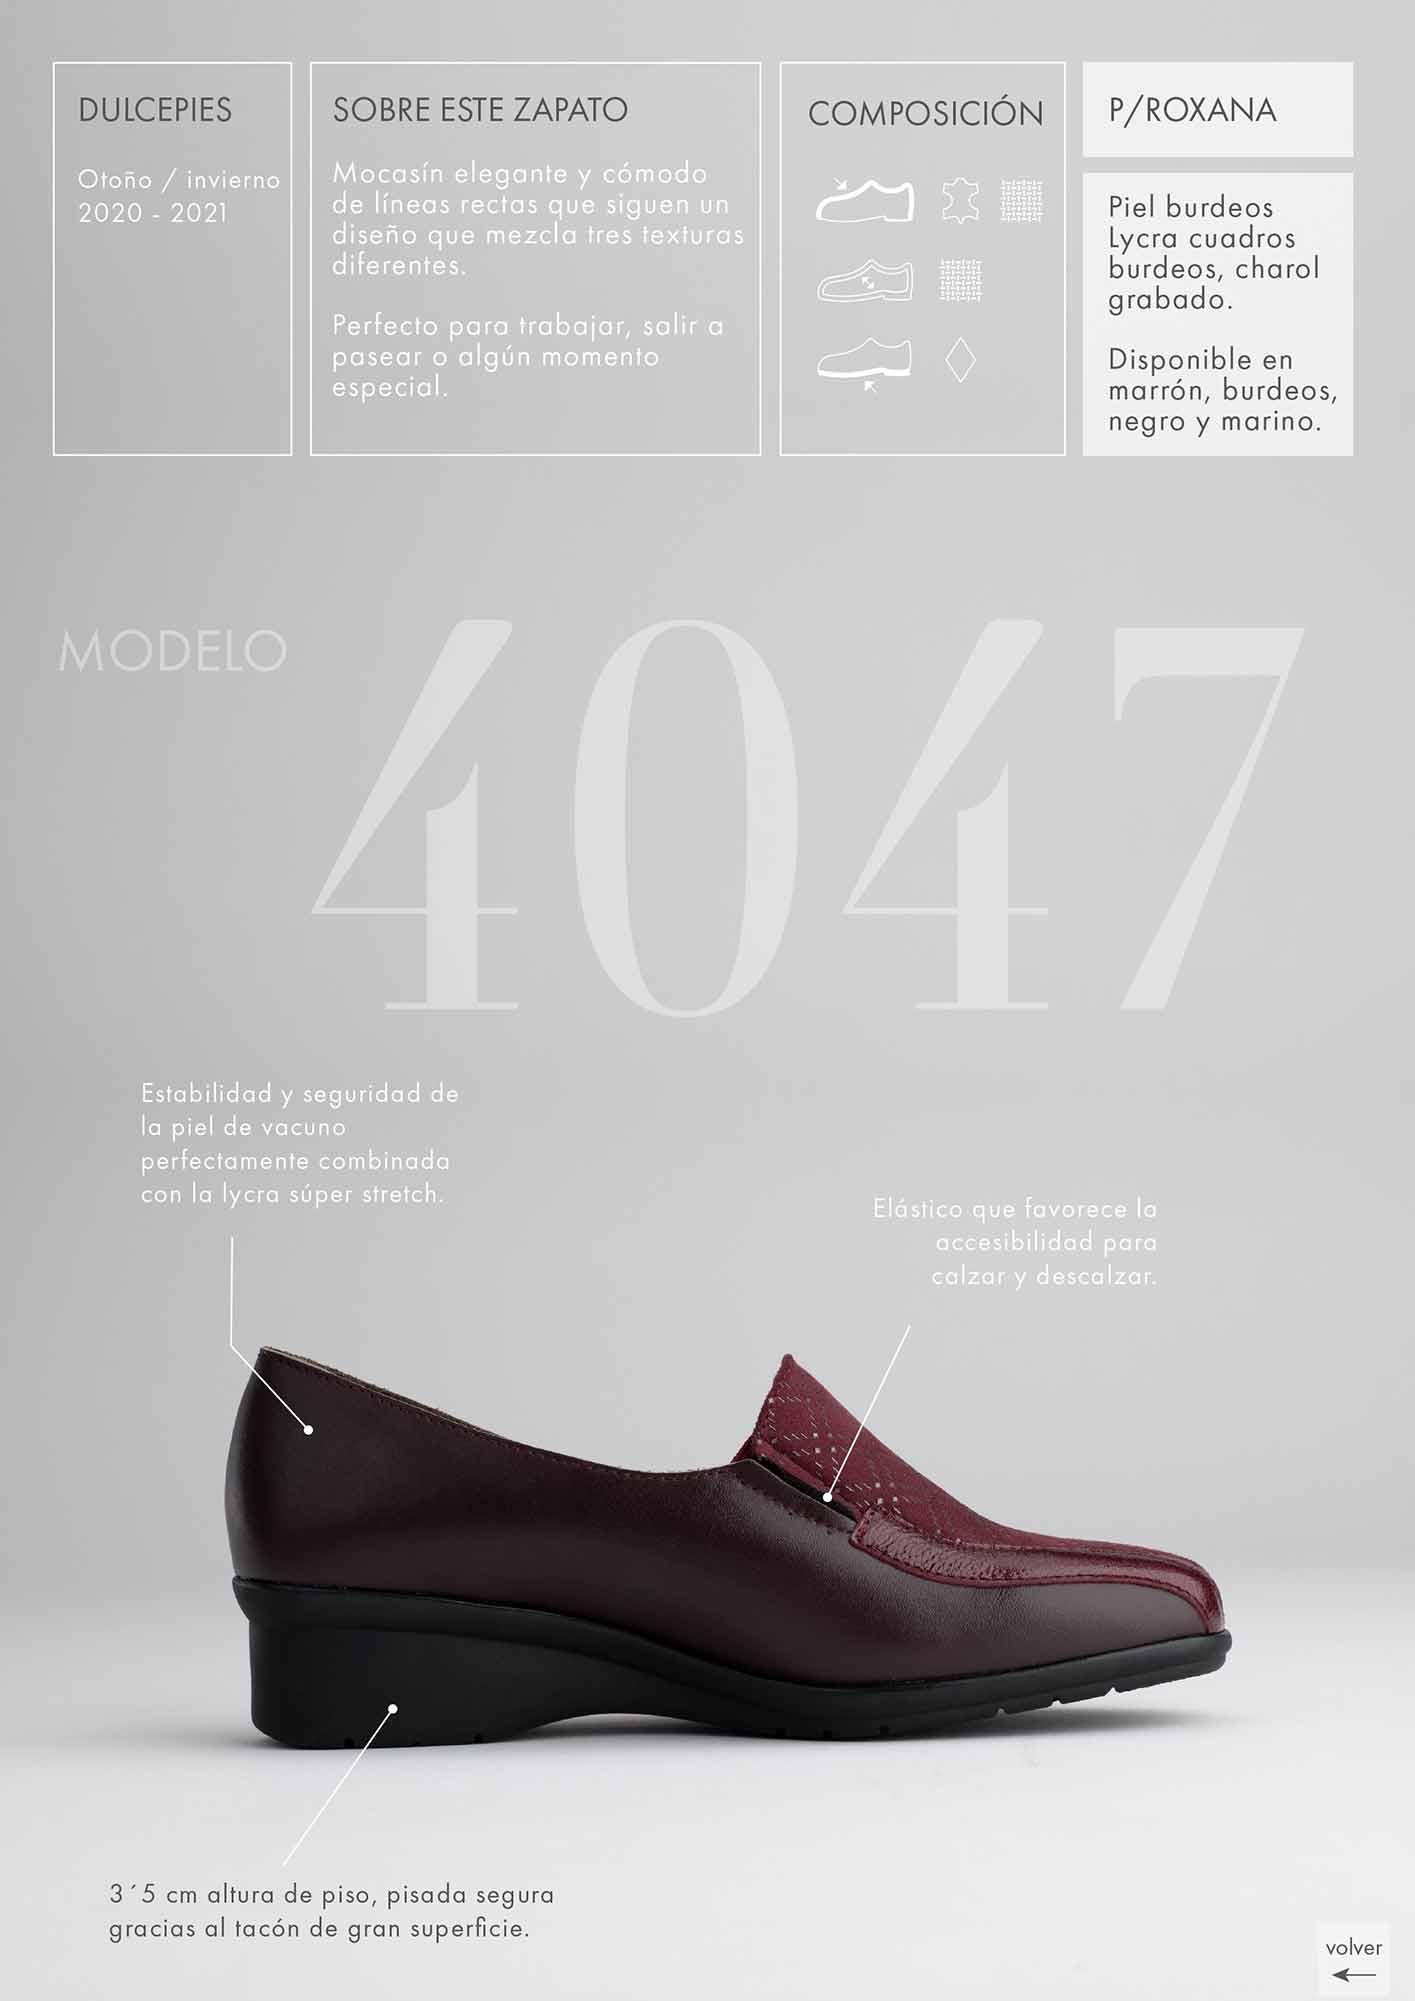 foto lateral de zapato elegante en catálogo